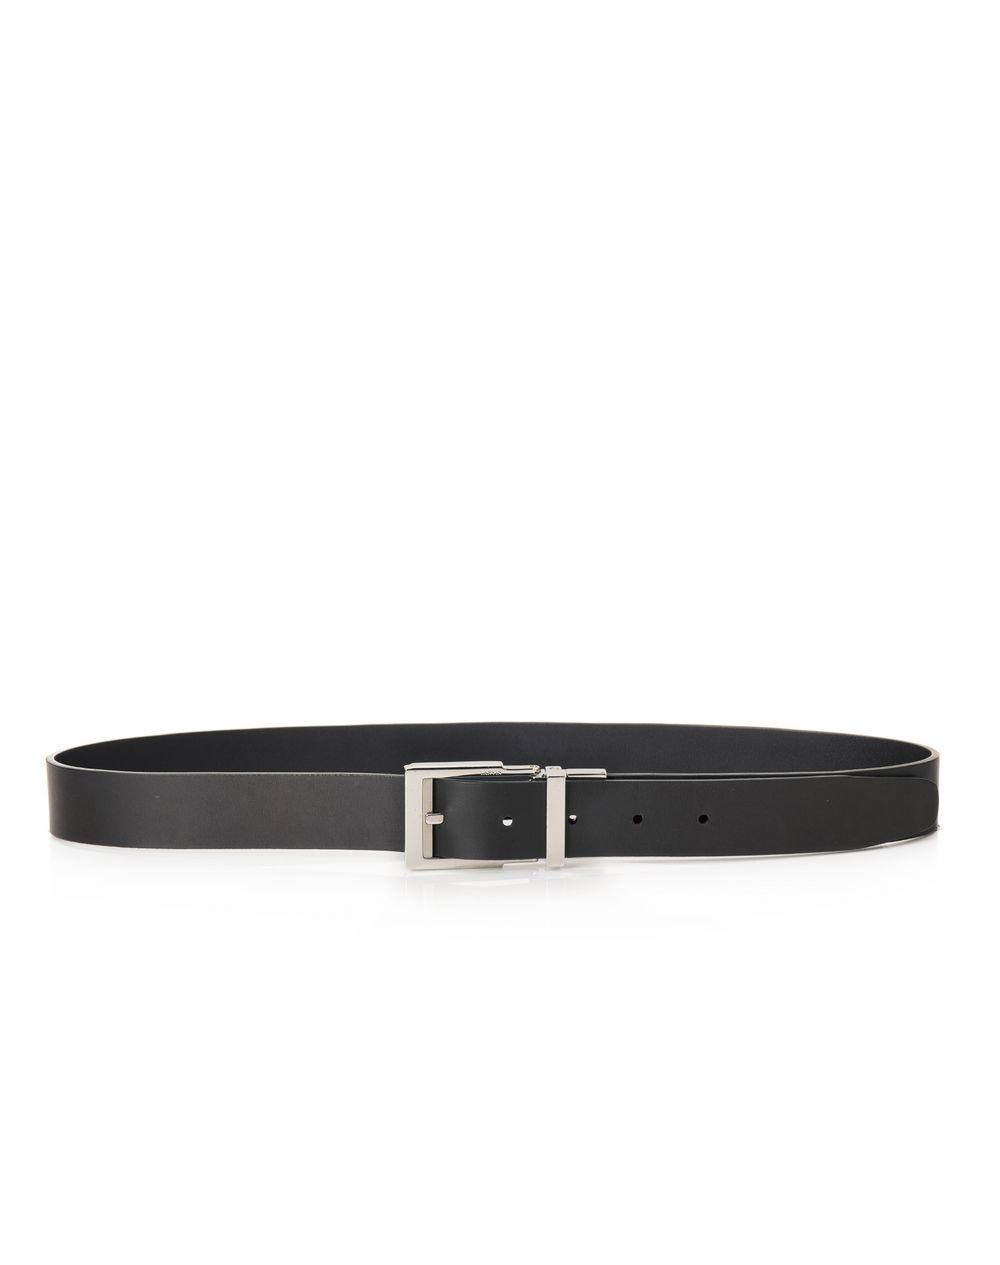 30mm reversible and adjustable belt in smooth calfskin - Lanvin